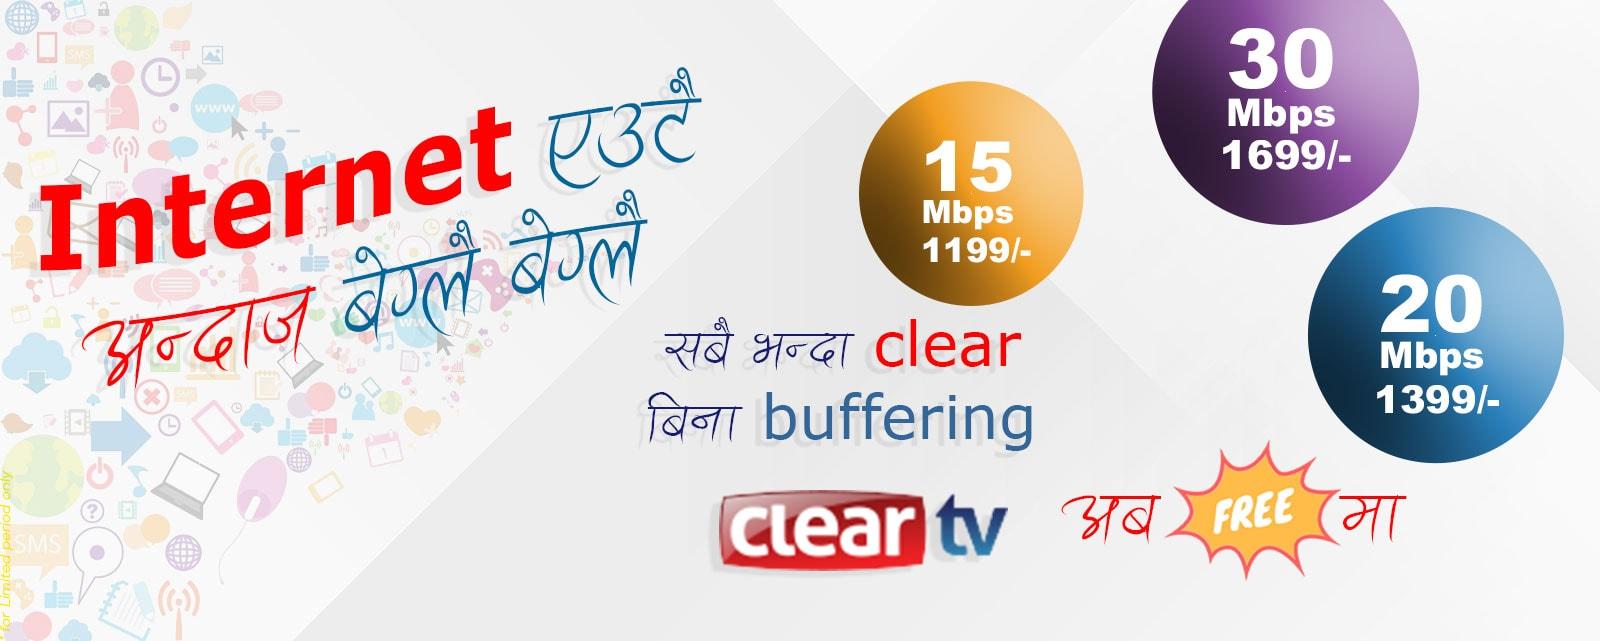 Pokhara Internet Pvt  Ltd  – The internet provider